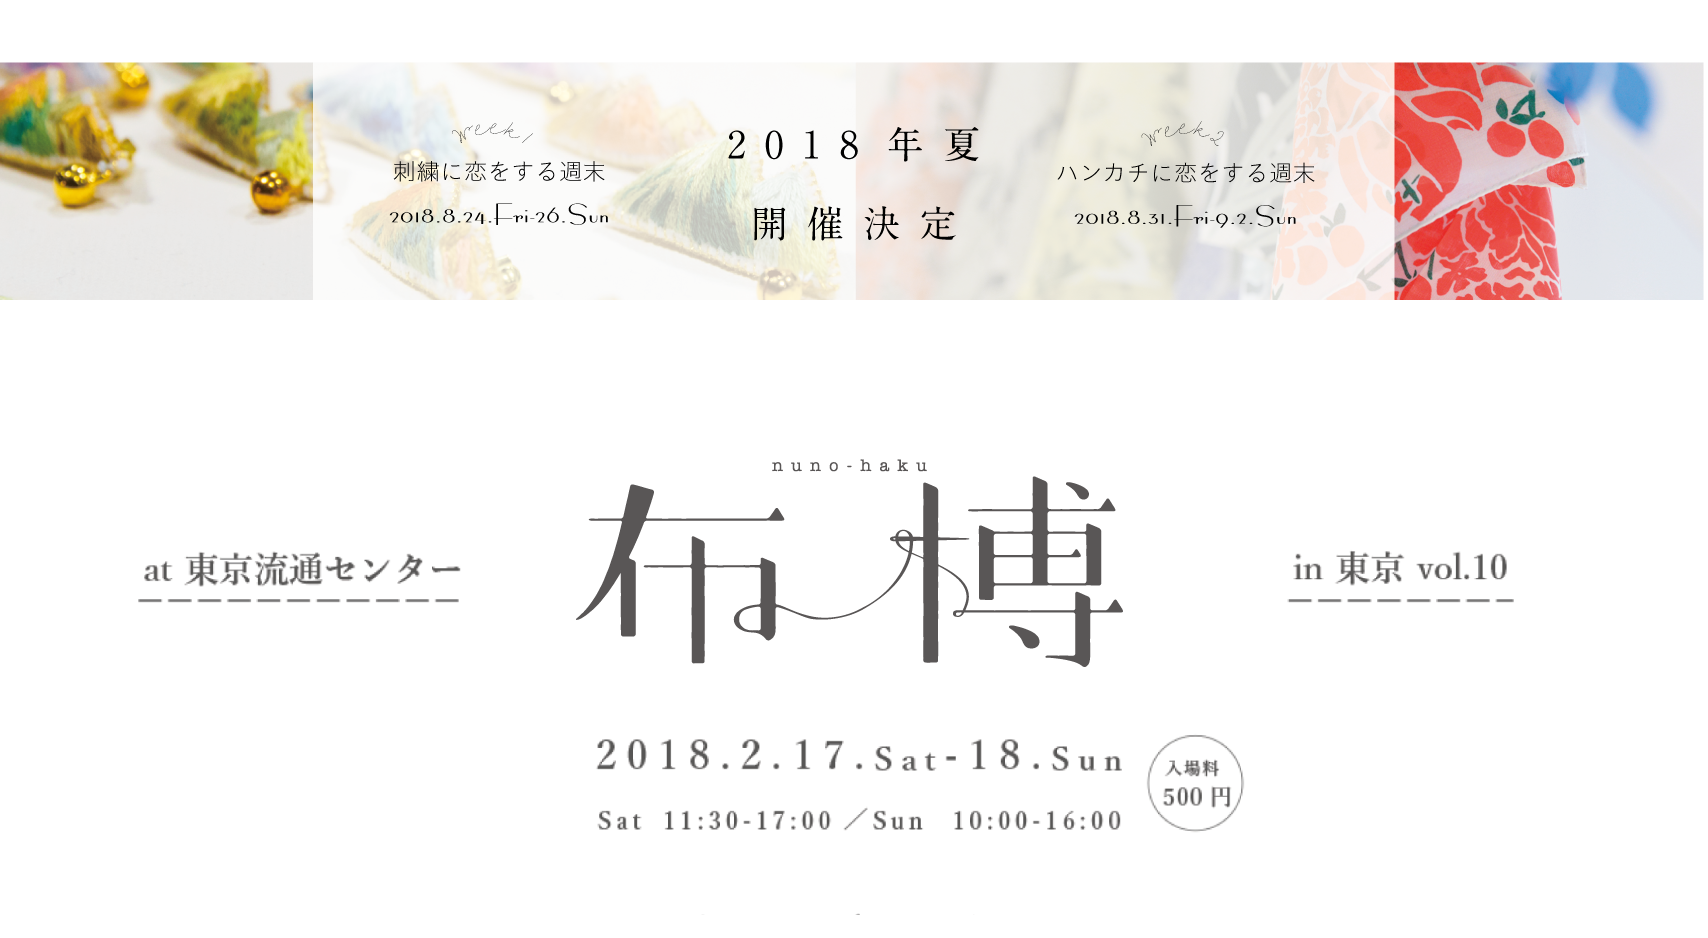 布博 in 東京 vol.10